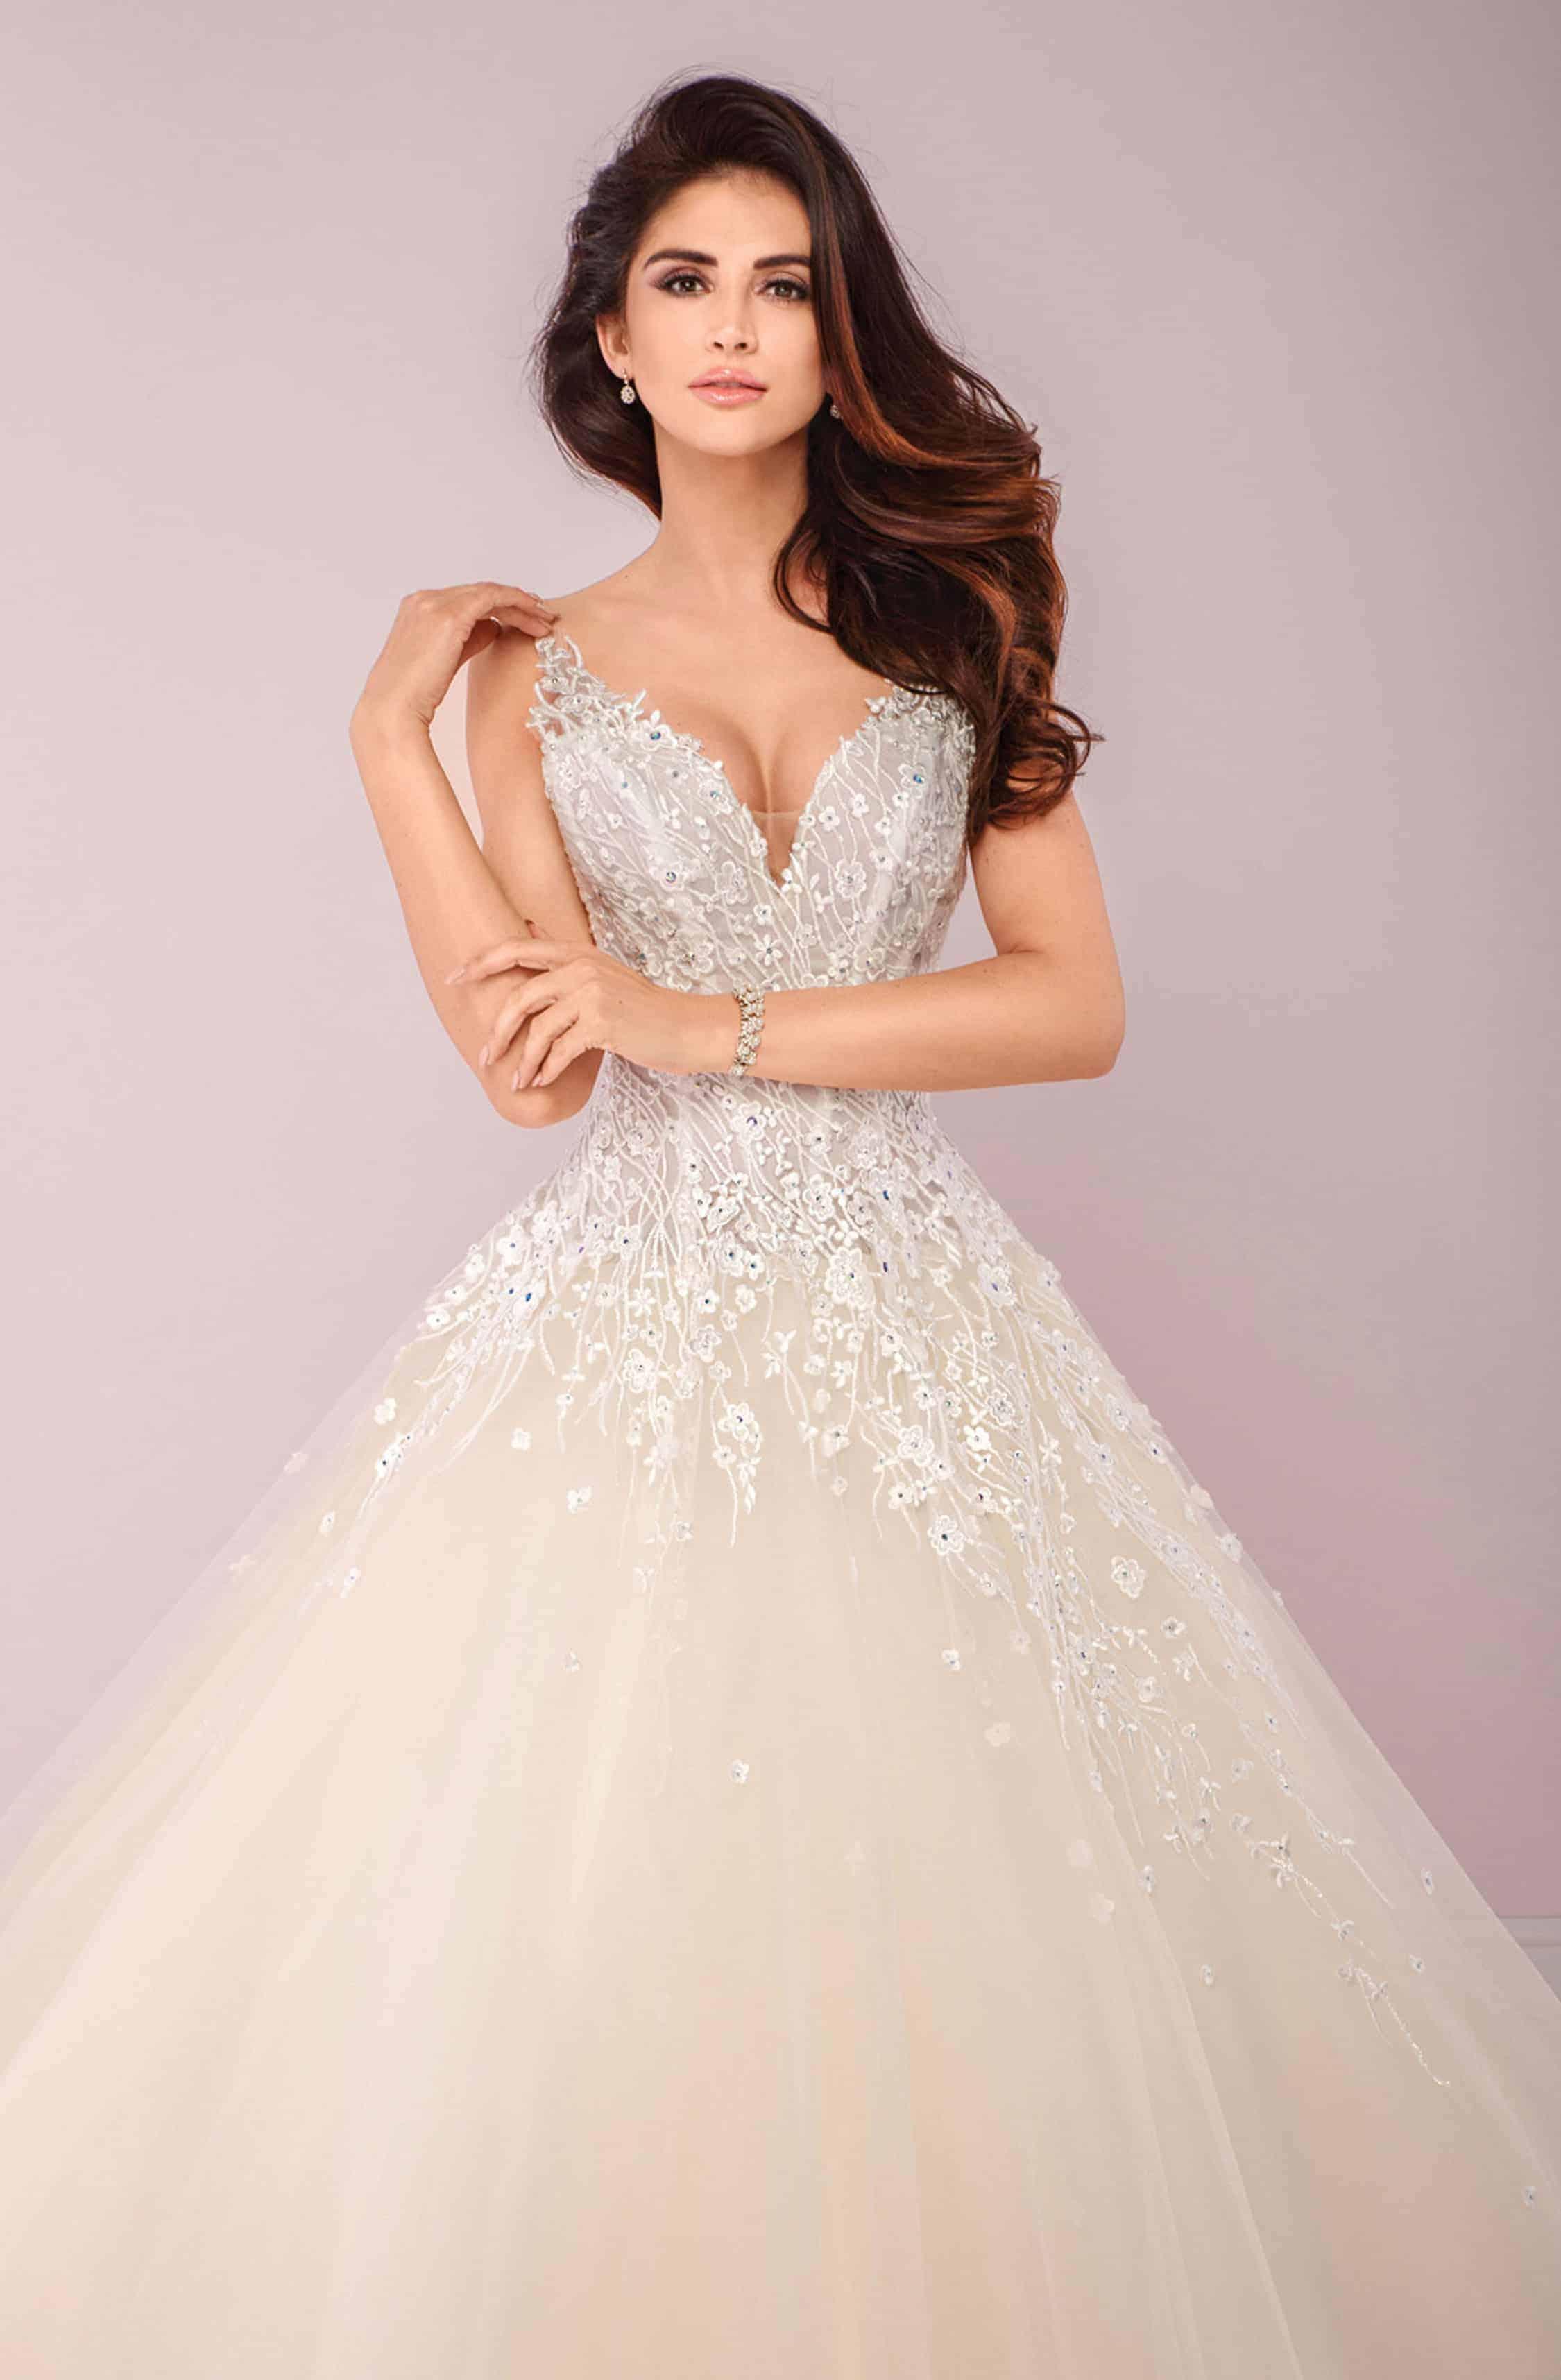 Agora | Brautkleid A-Linie | Hochzeitskleid Prinzessin | Brautmode Köln Anna Moda